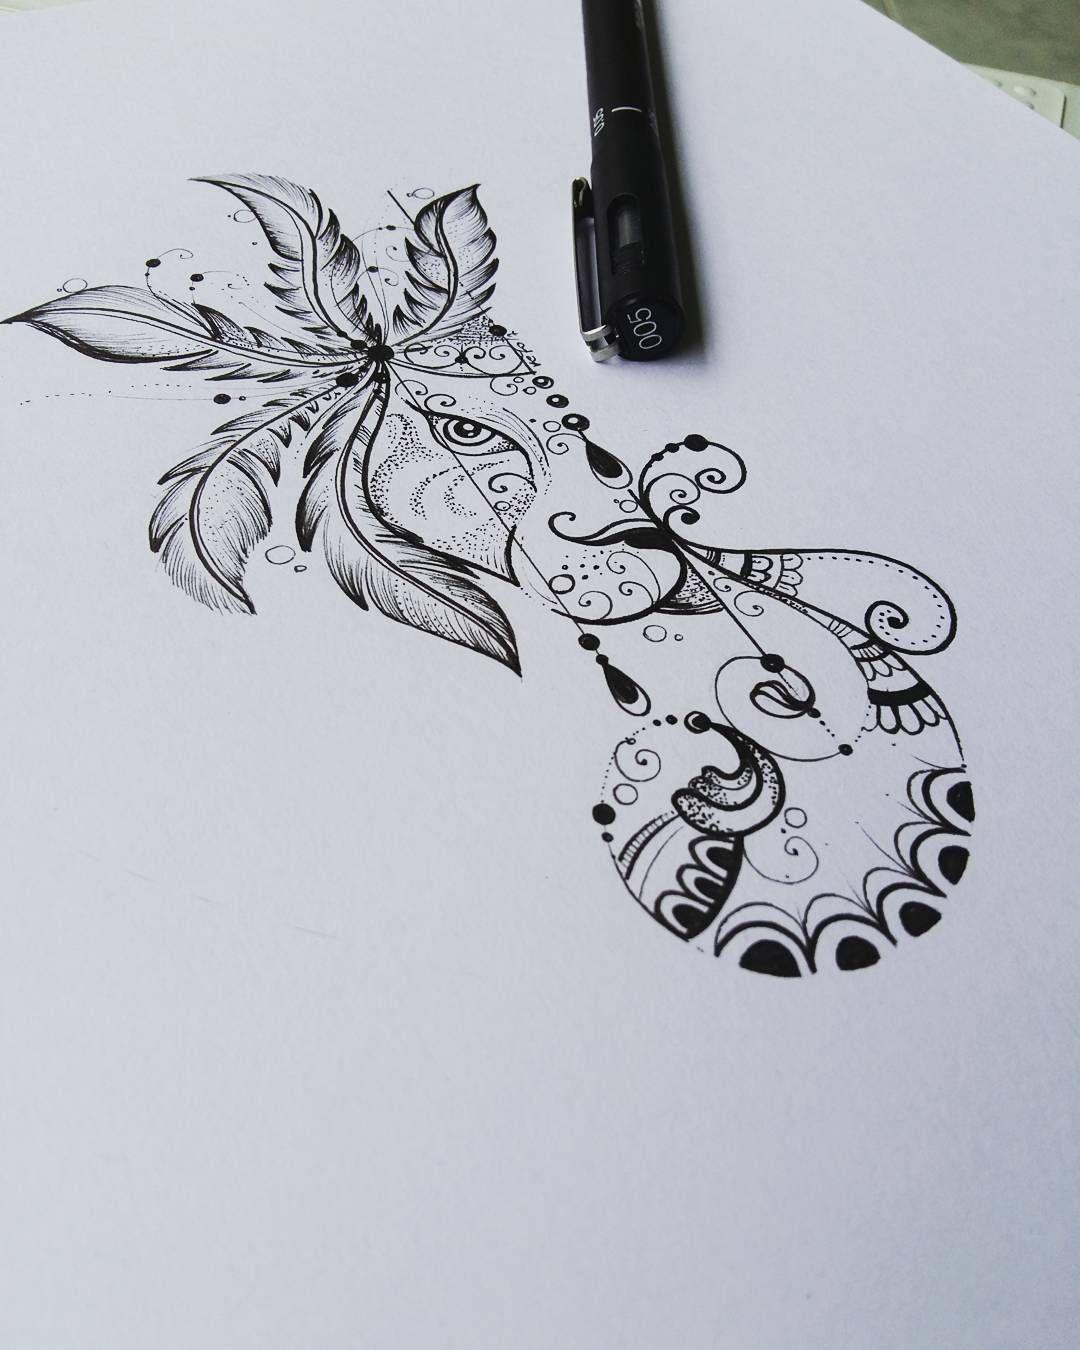 кружки со знаком льва